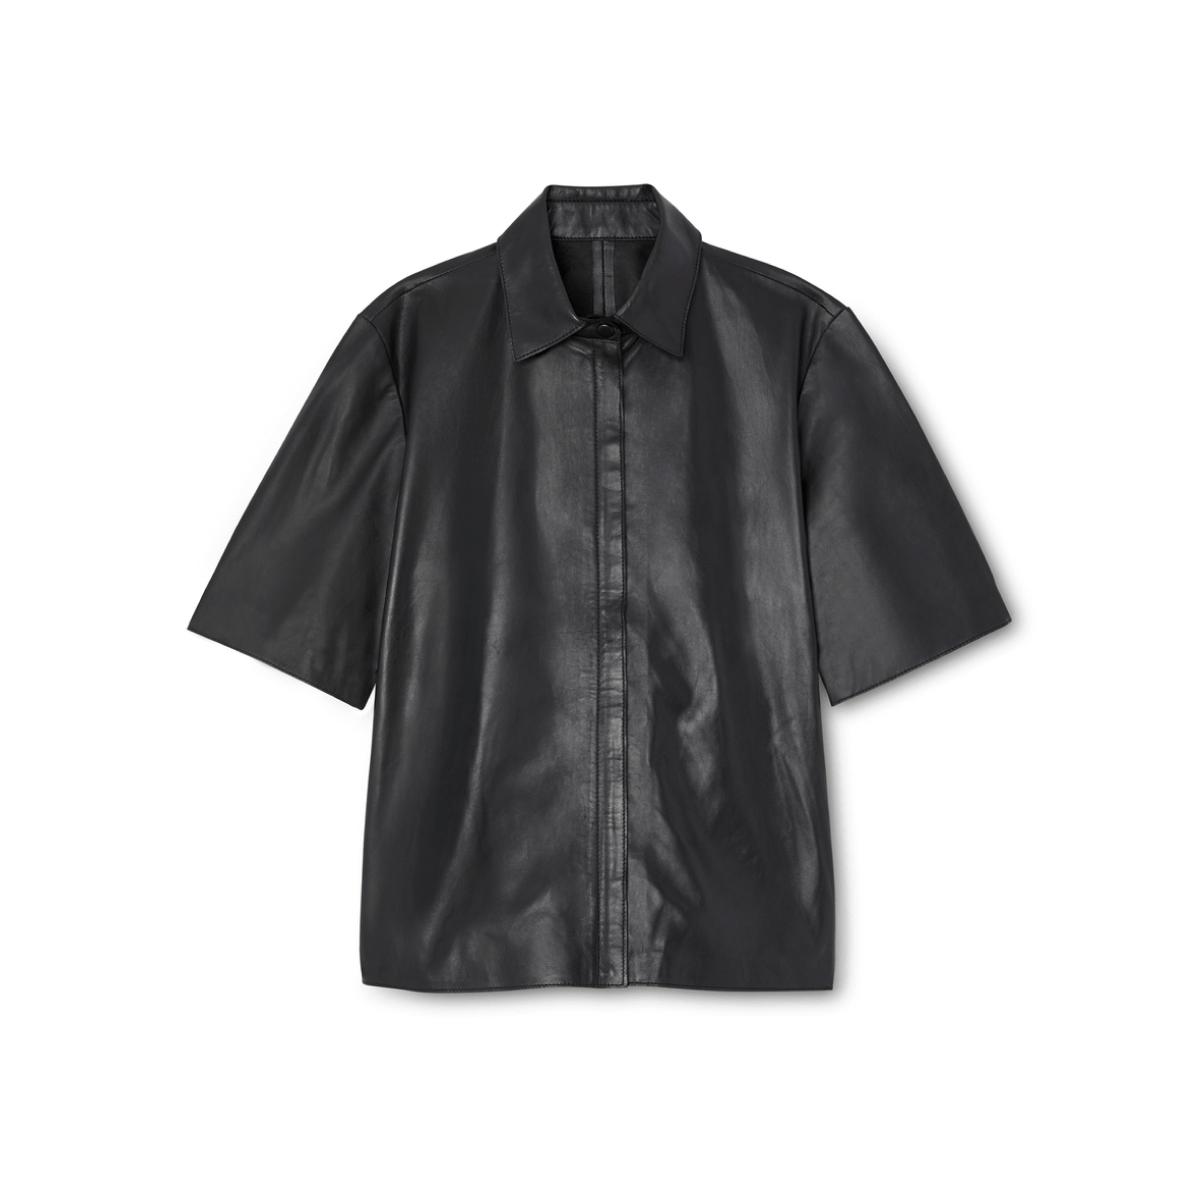 G. Label taylor boy leather shirt